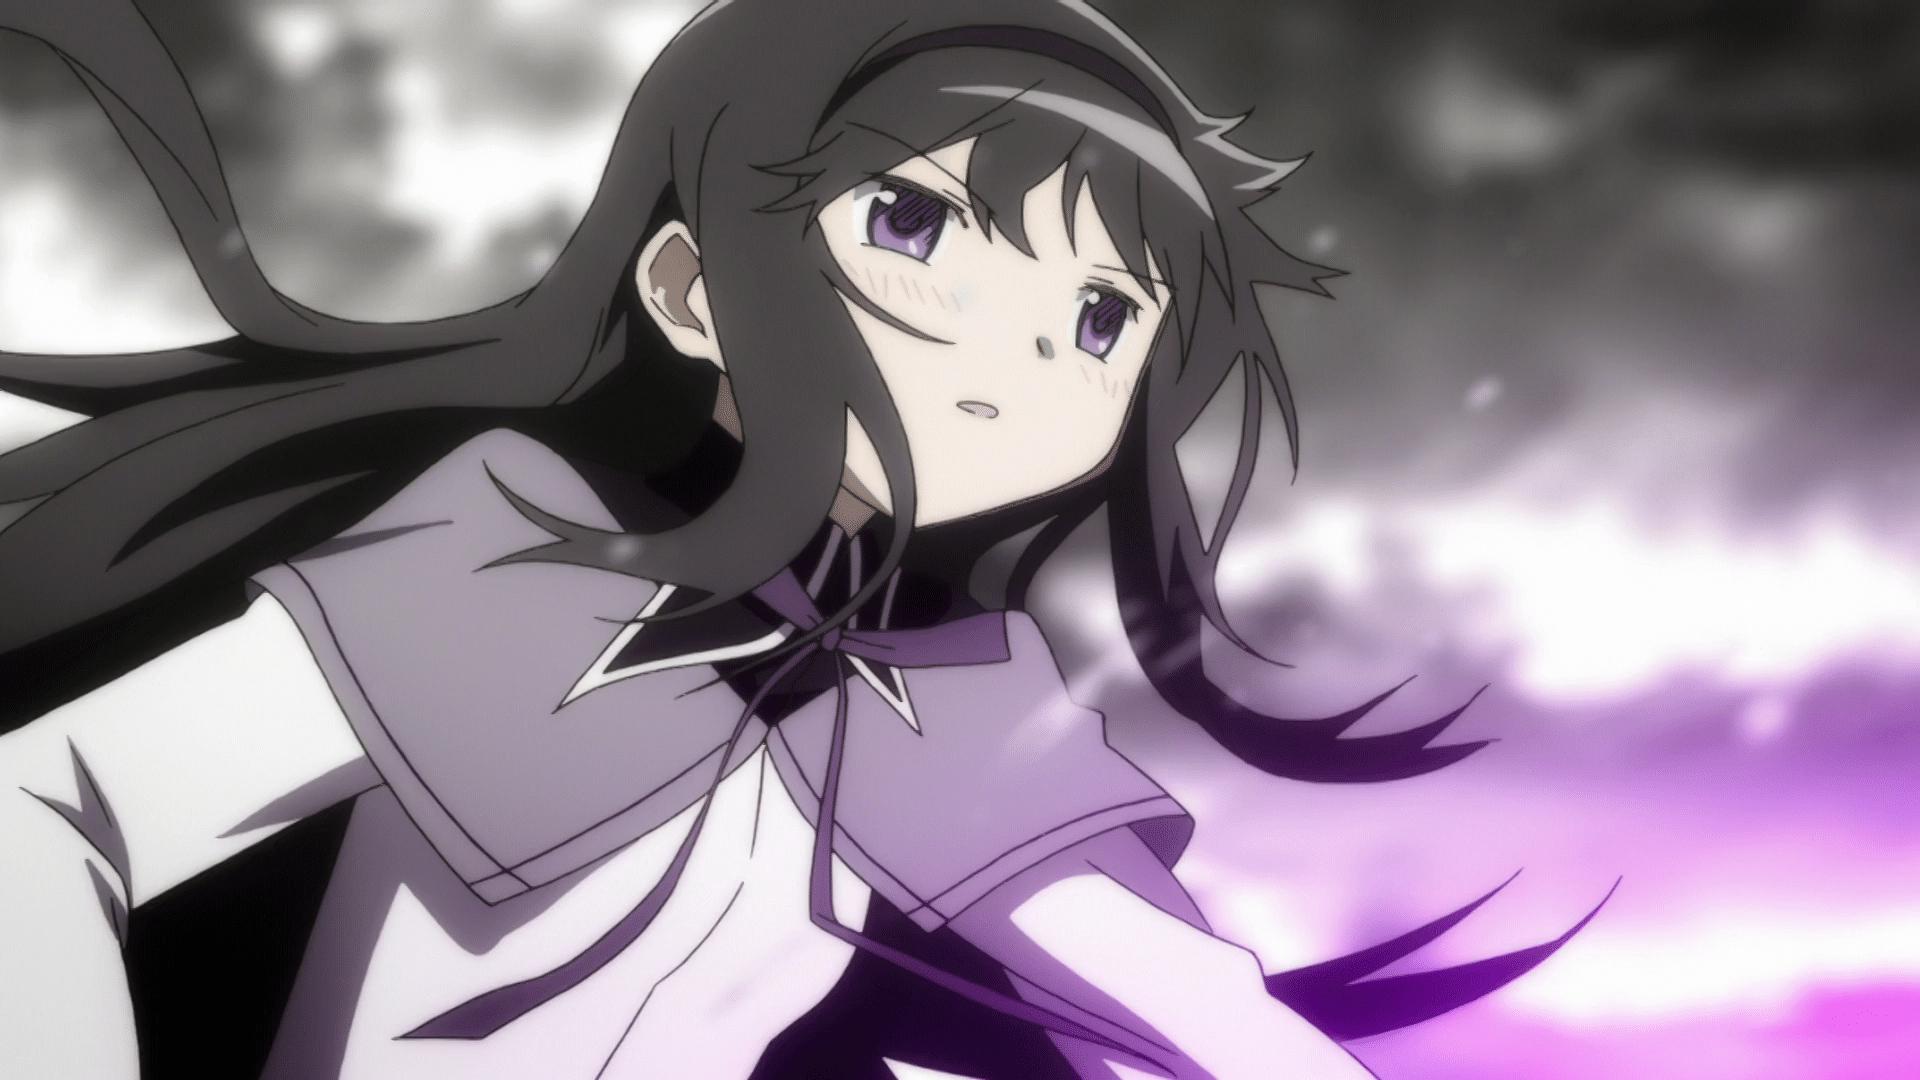 Nomura Akemi (Puella Magi Madoka Magica)